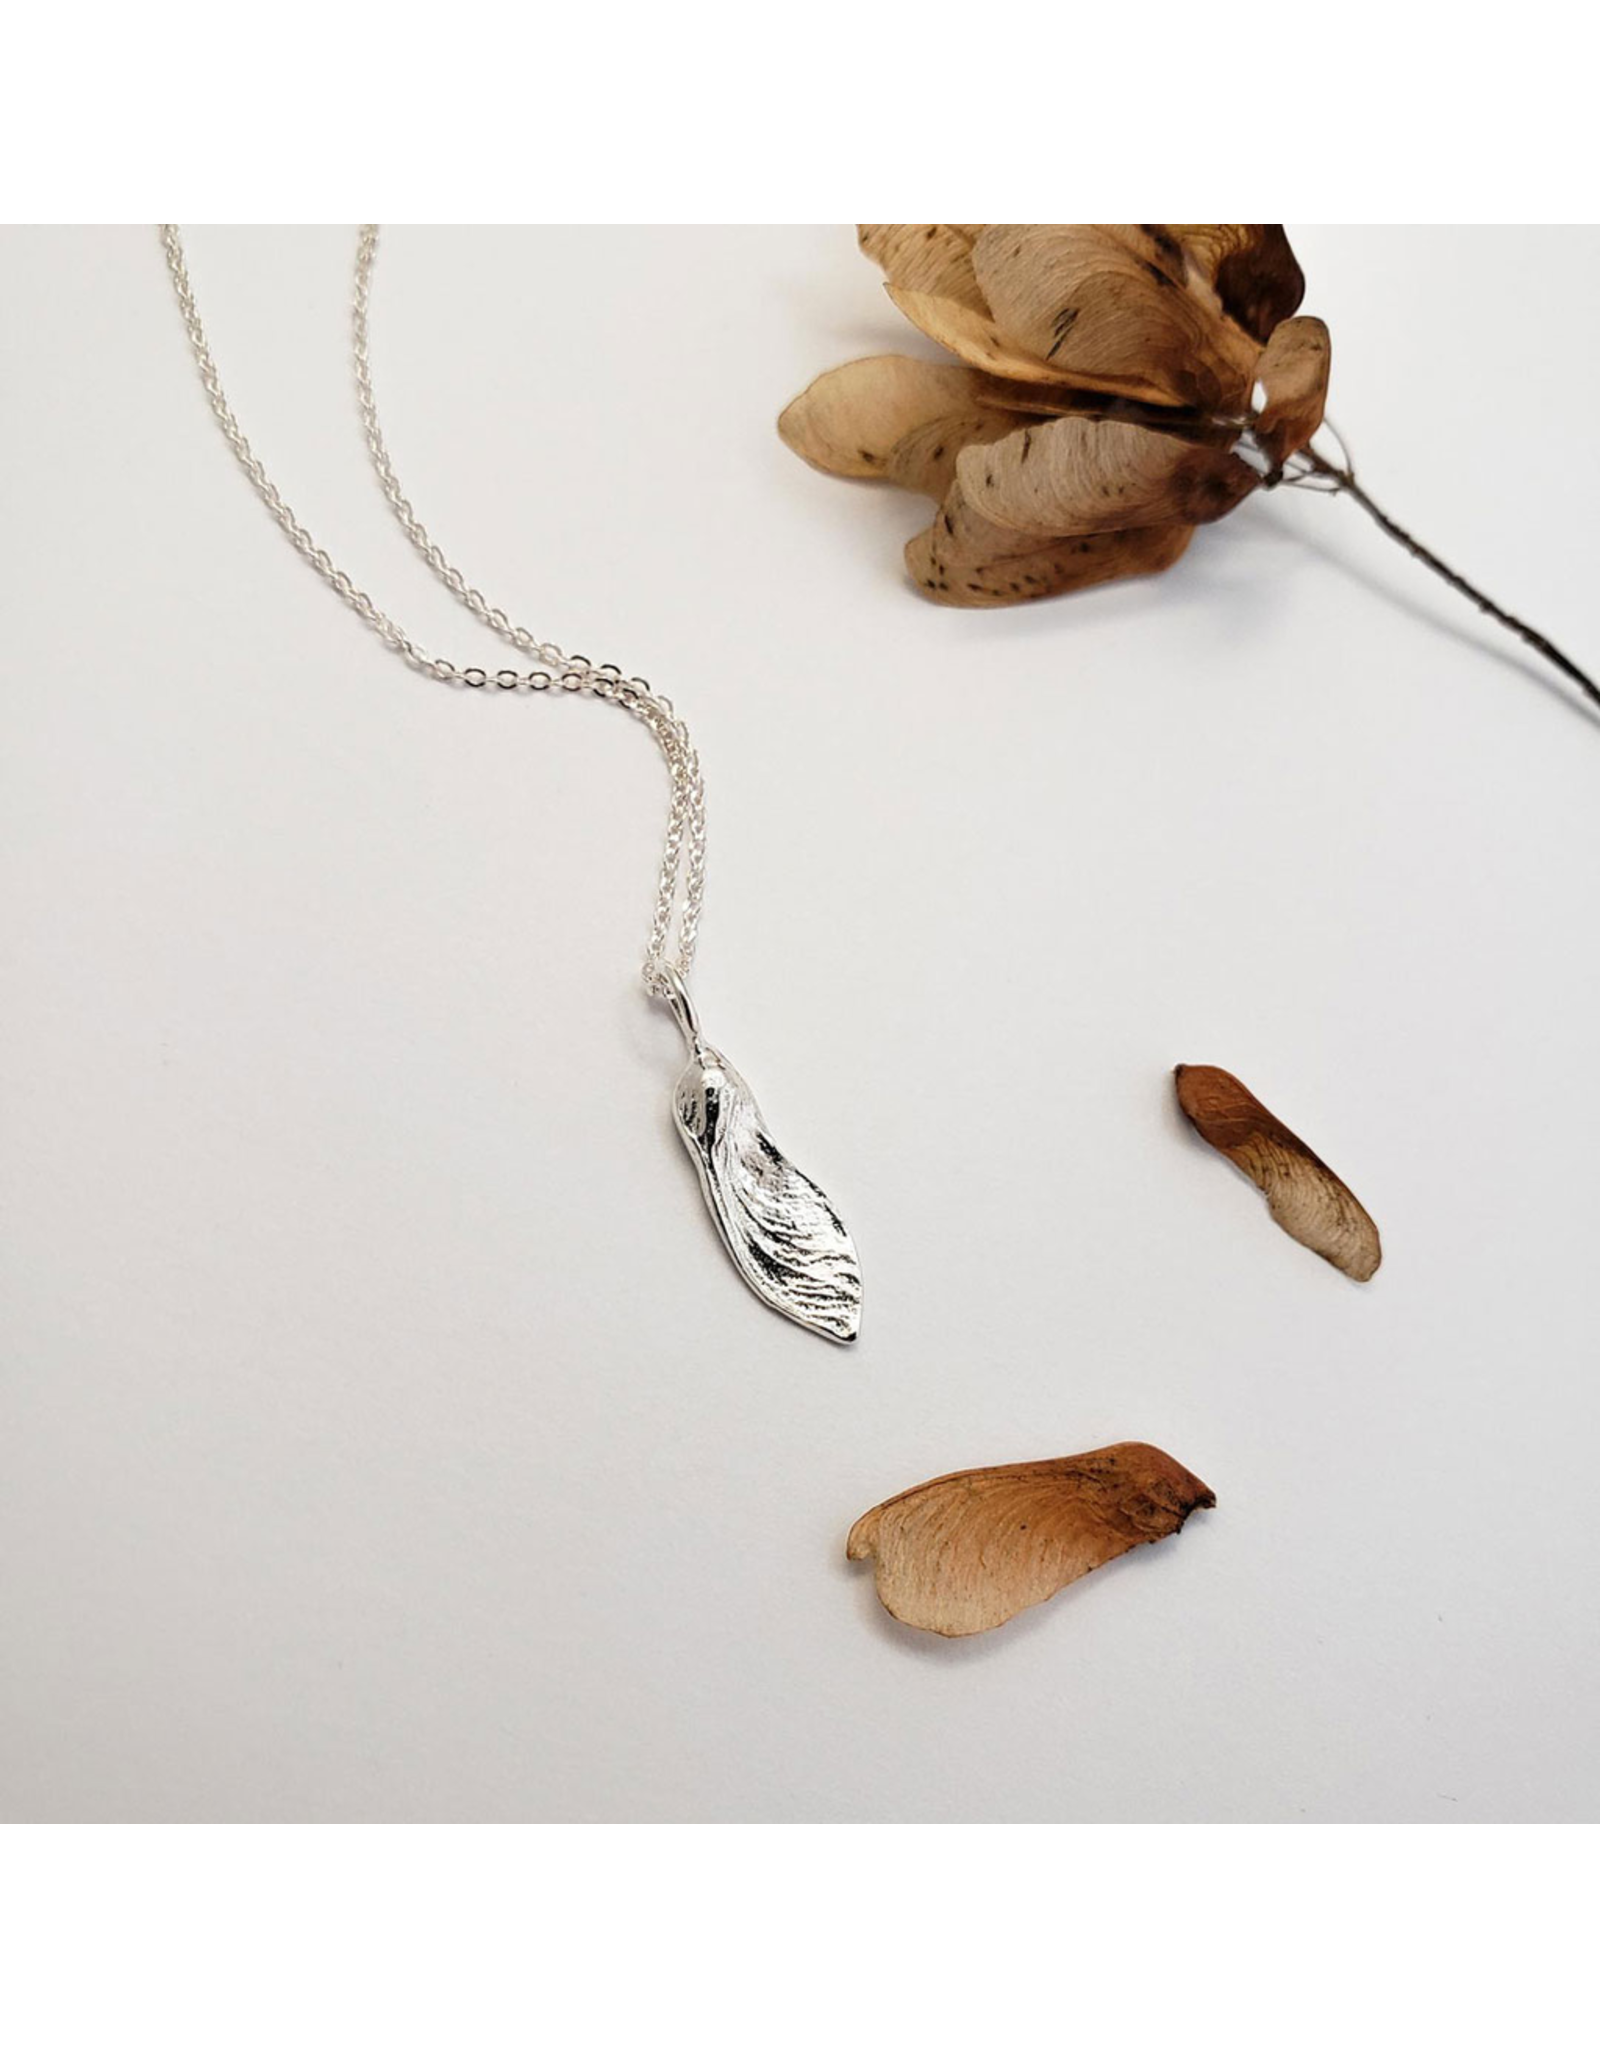 Maple Key Pendant - Sterling Silver